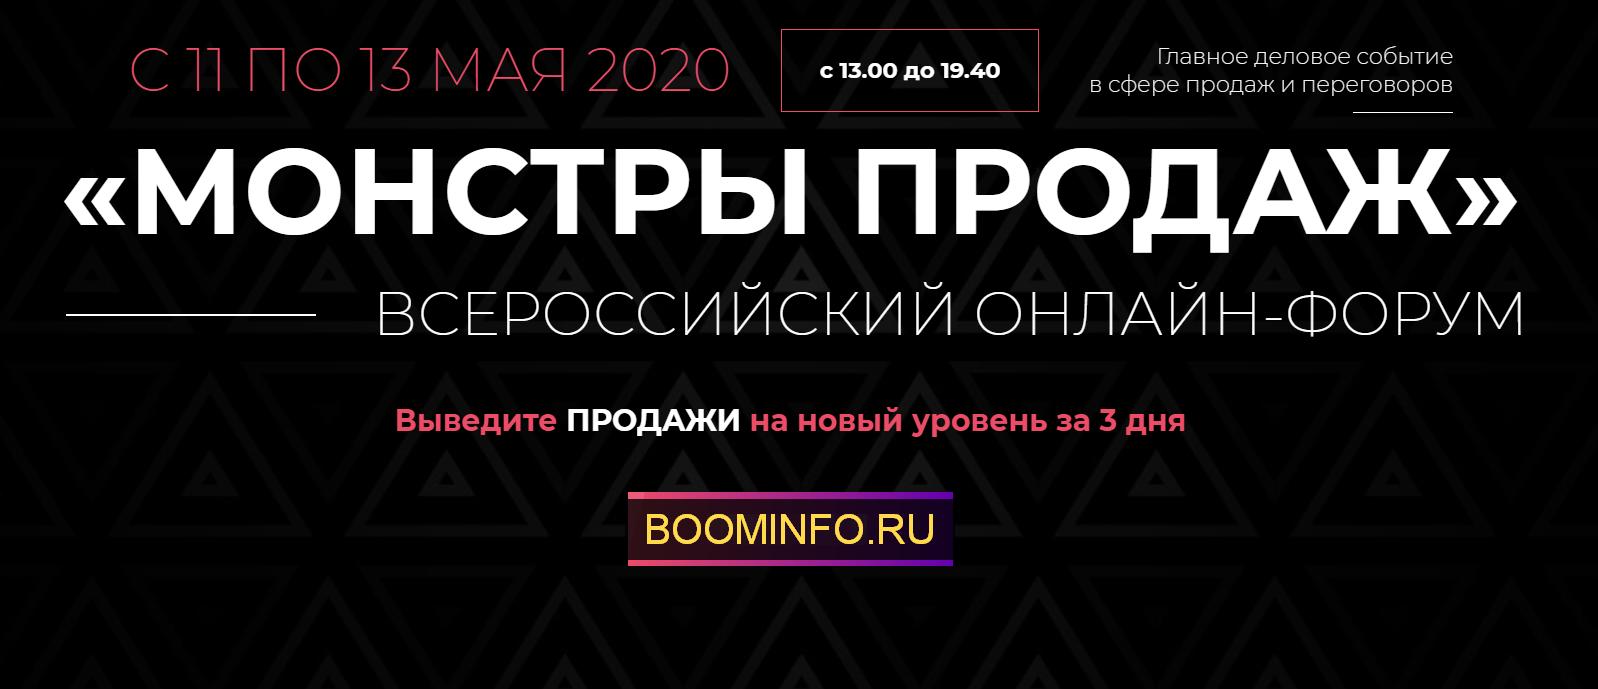 2020-06-05_21-02-38